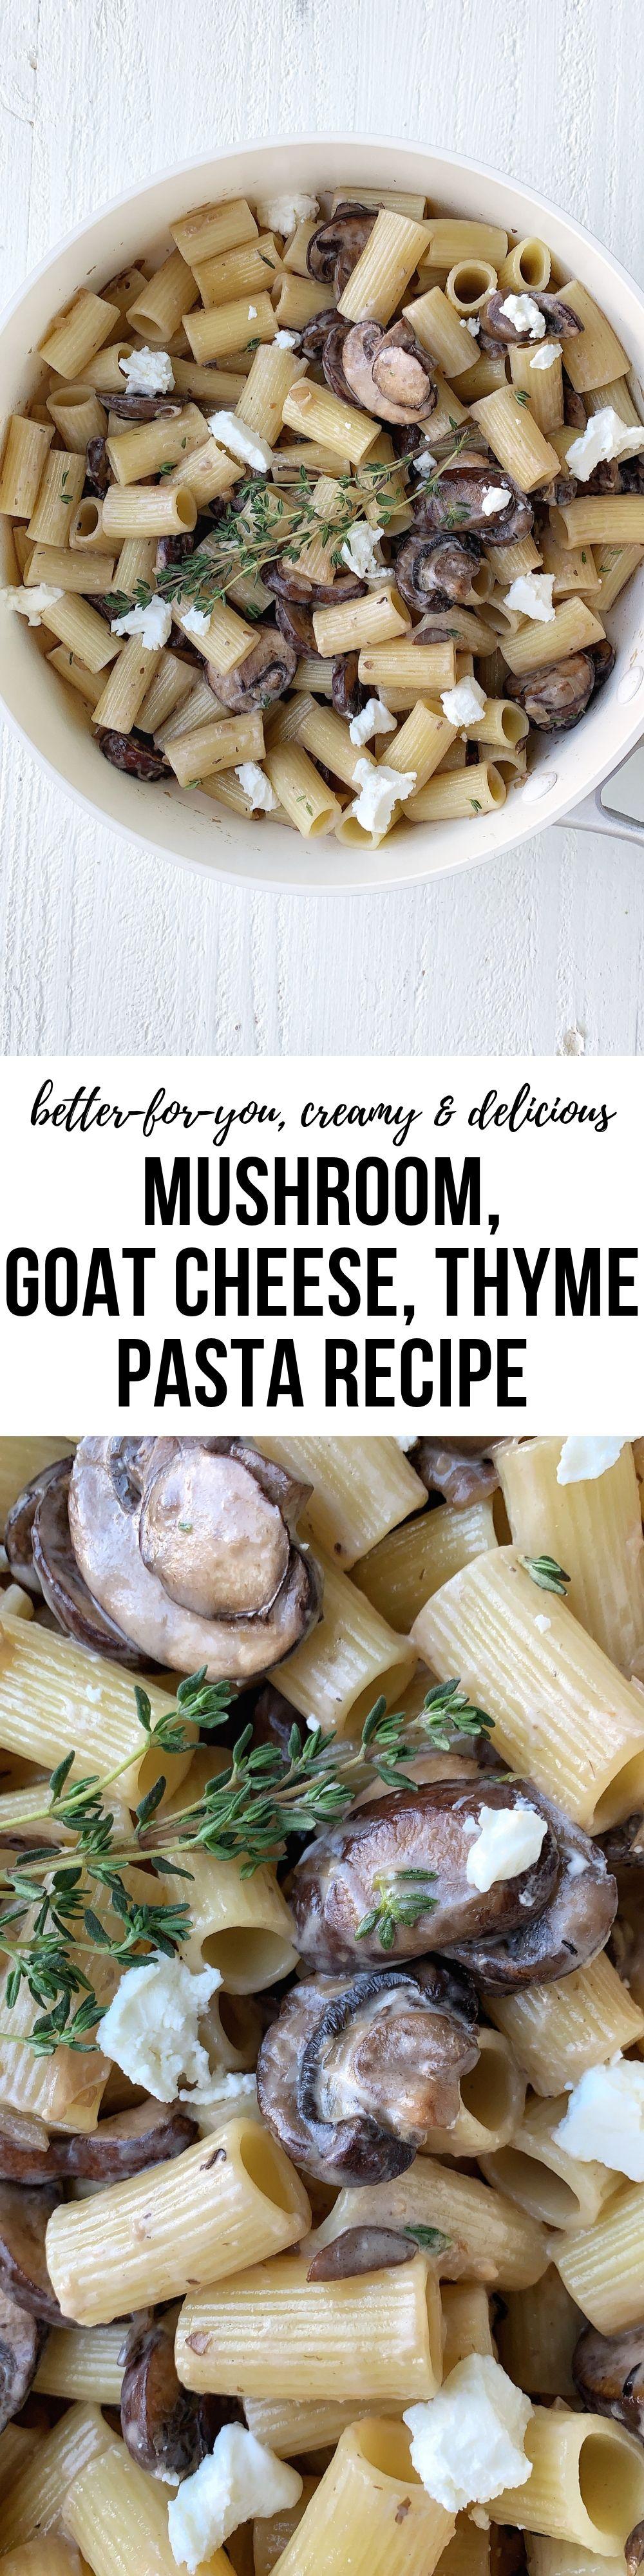 creamy goat cheese pasta recipe